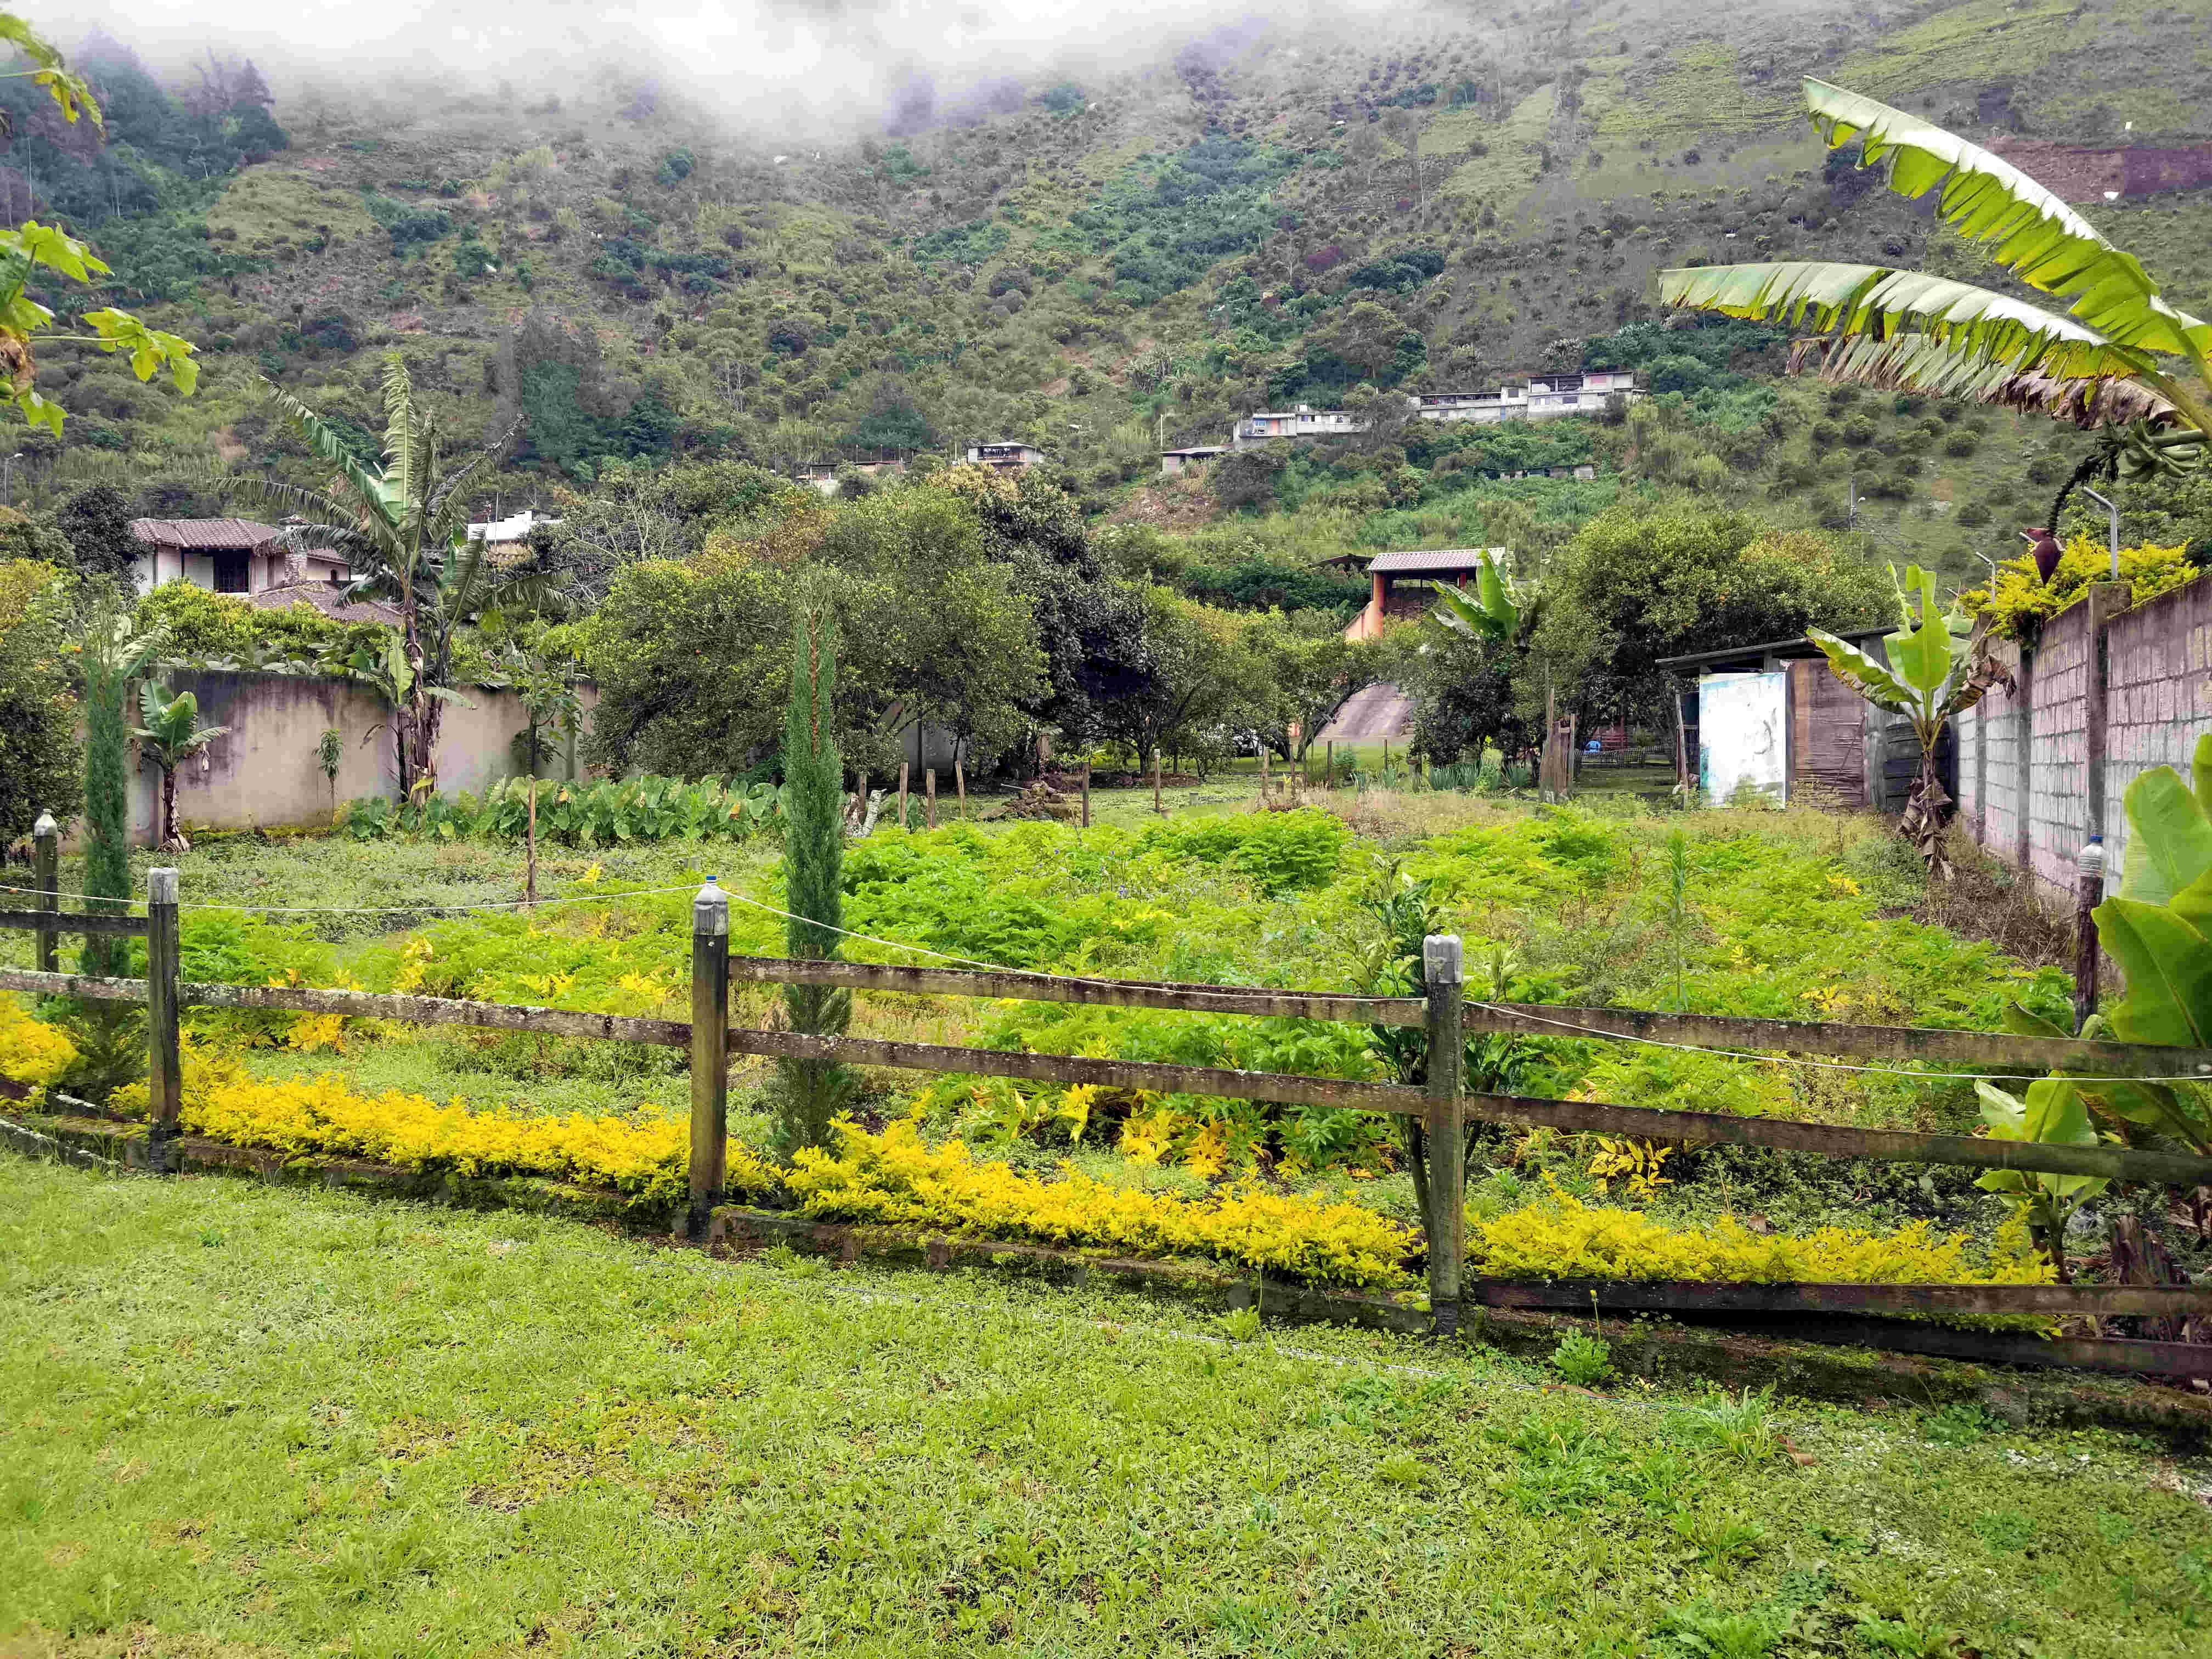 Property where we stayed in Banos Ecuador Mark Beneke